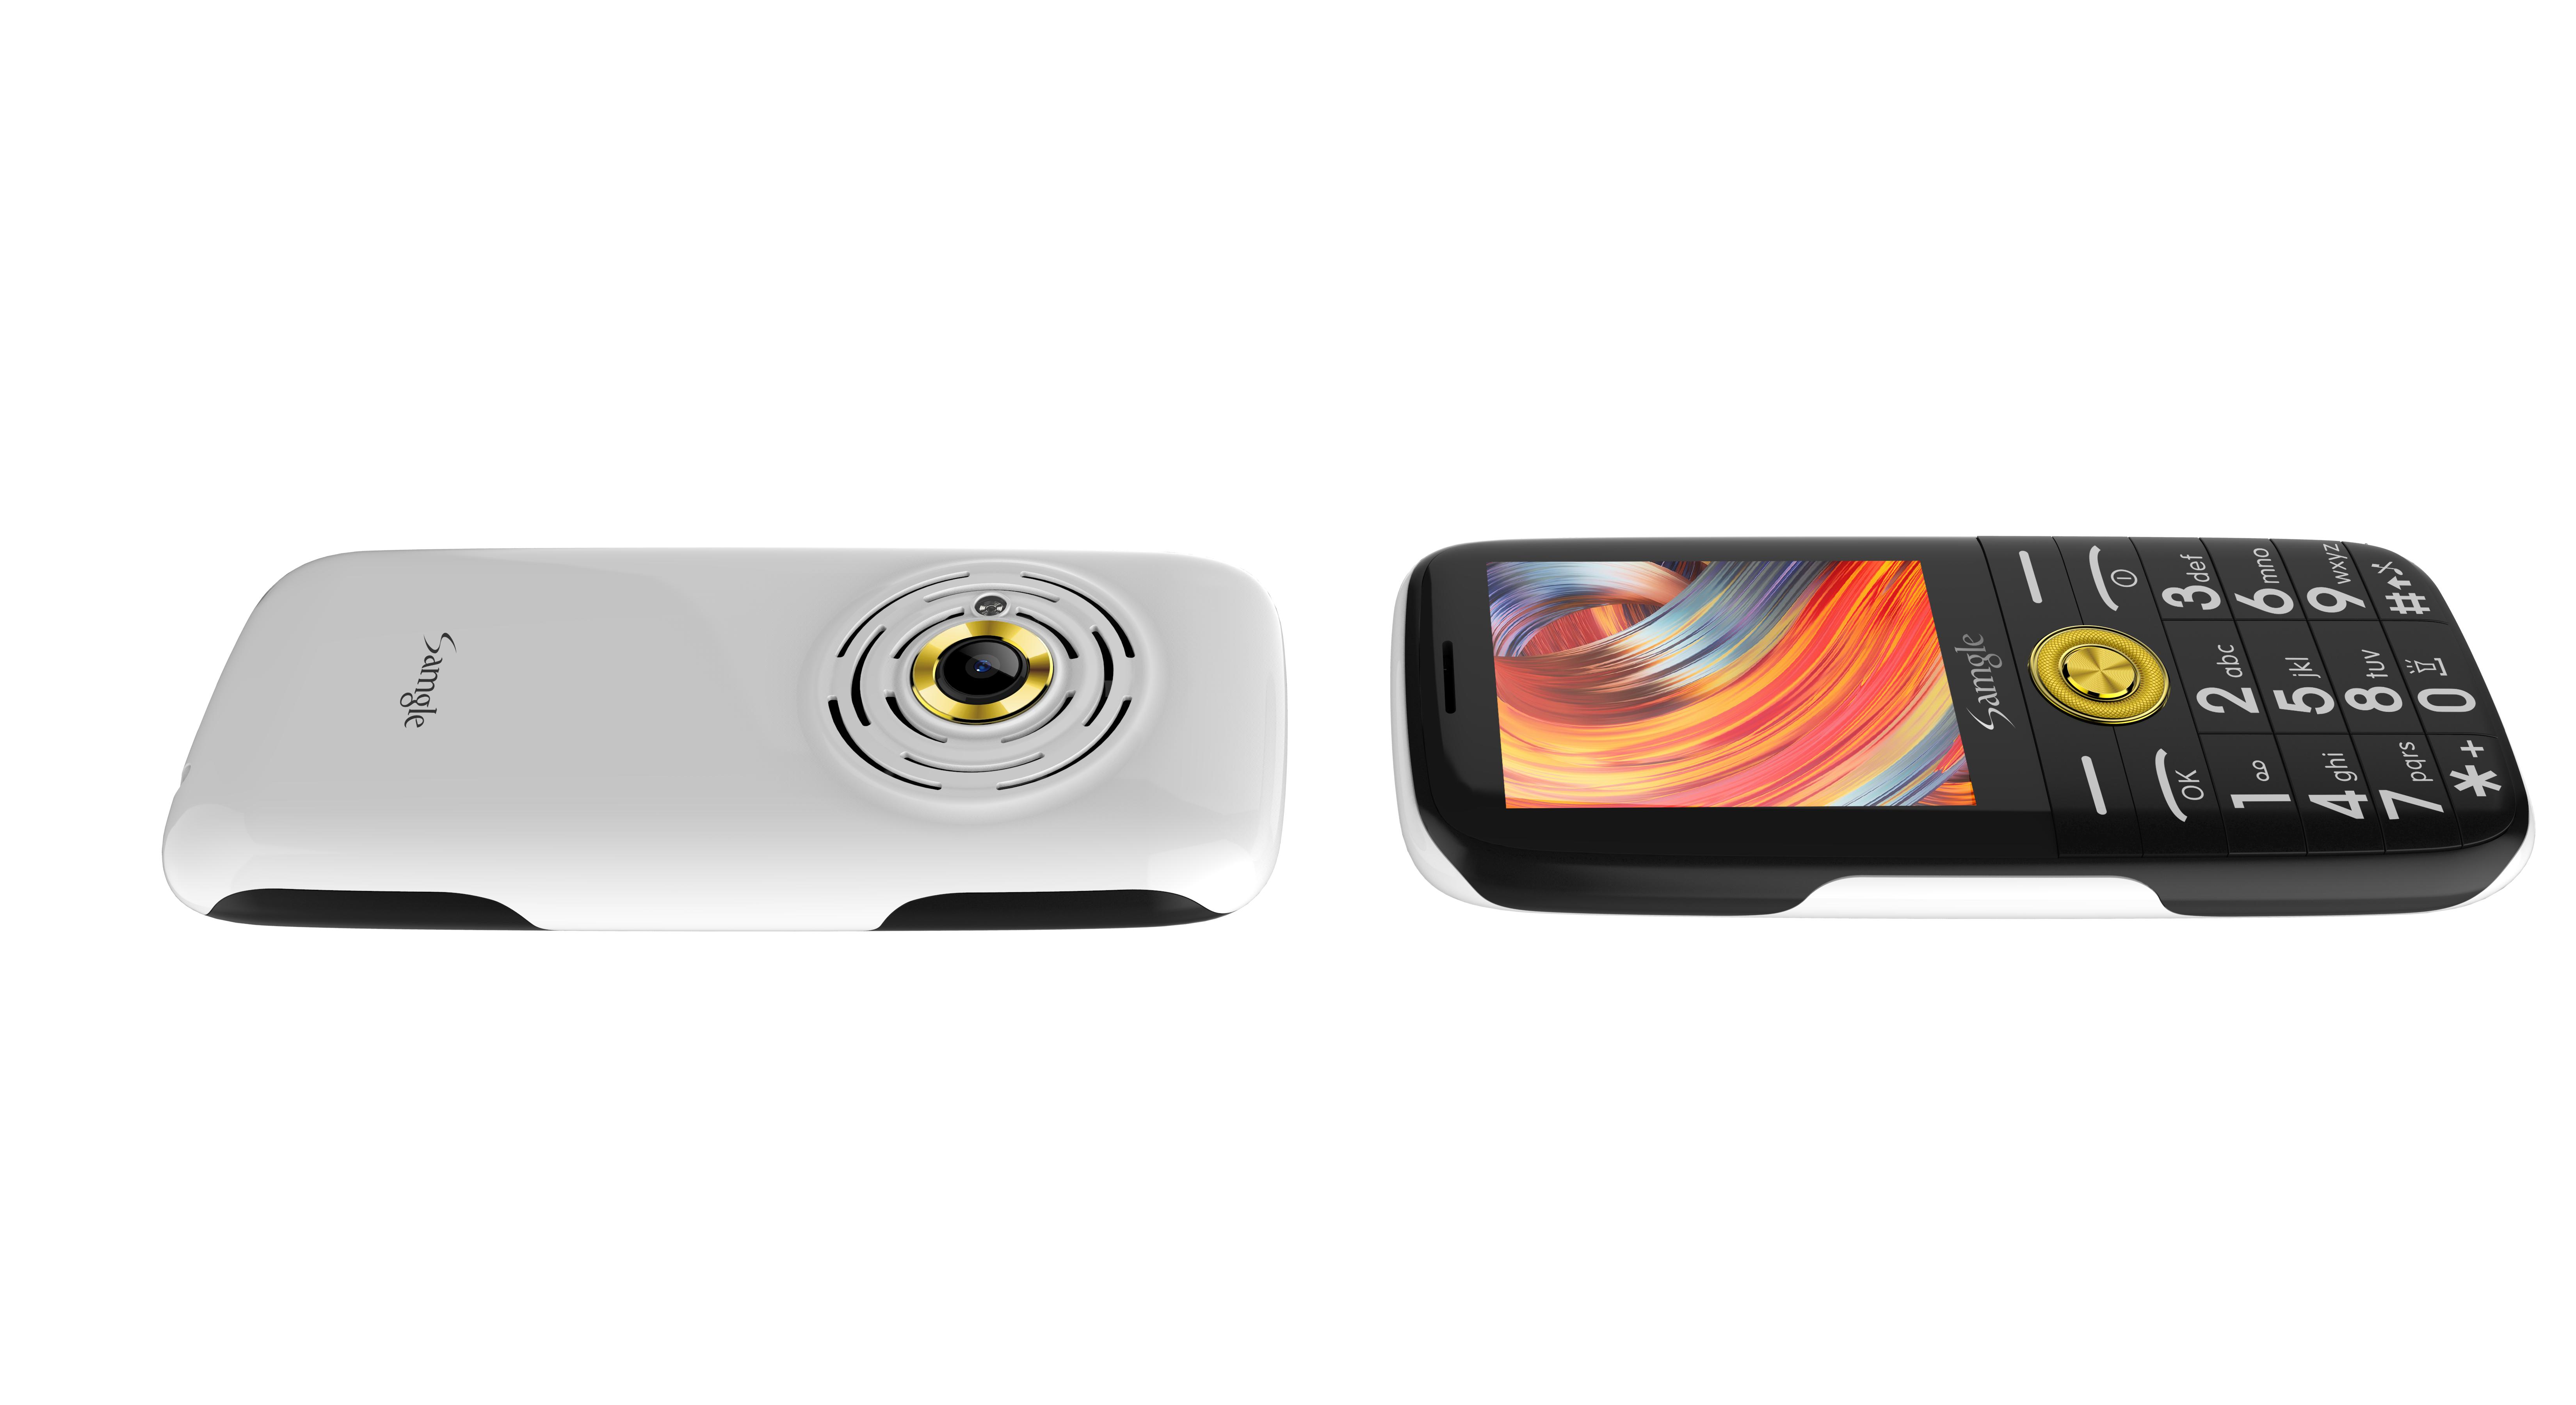 Telefon mobil Samgle Captain 3G, QVGA 2.4 inch, Bluetooth, Digi 3G, Camera, Slot Card, Radio FM, Internet, Dual SIM11